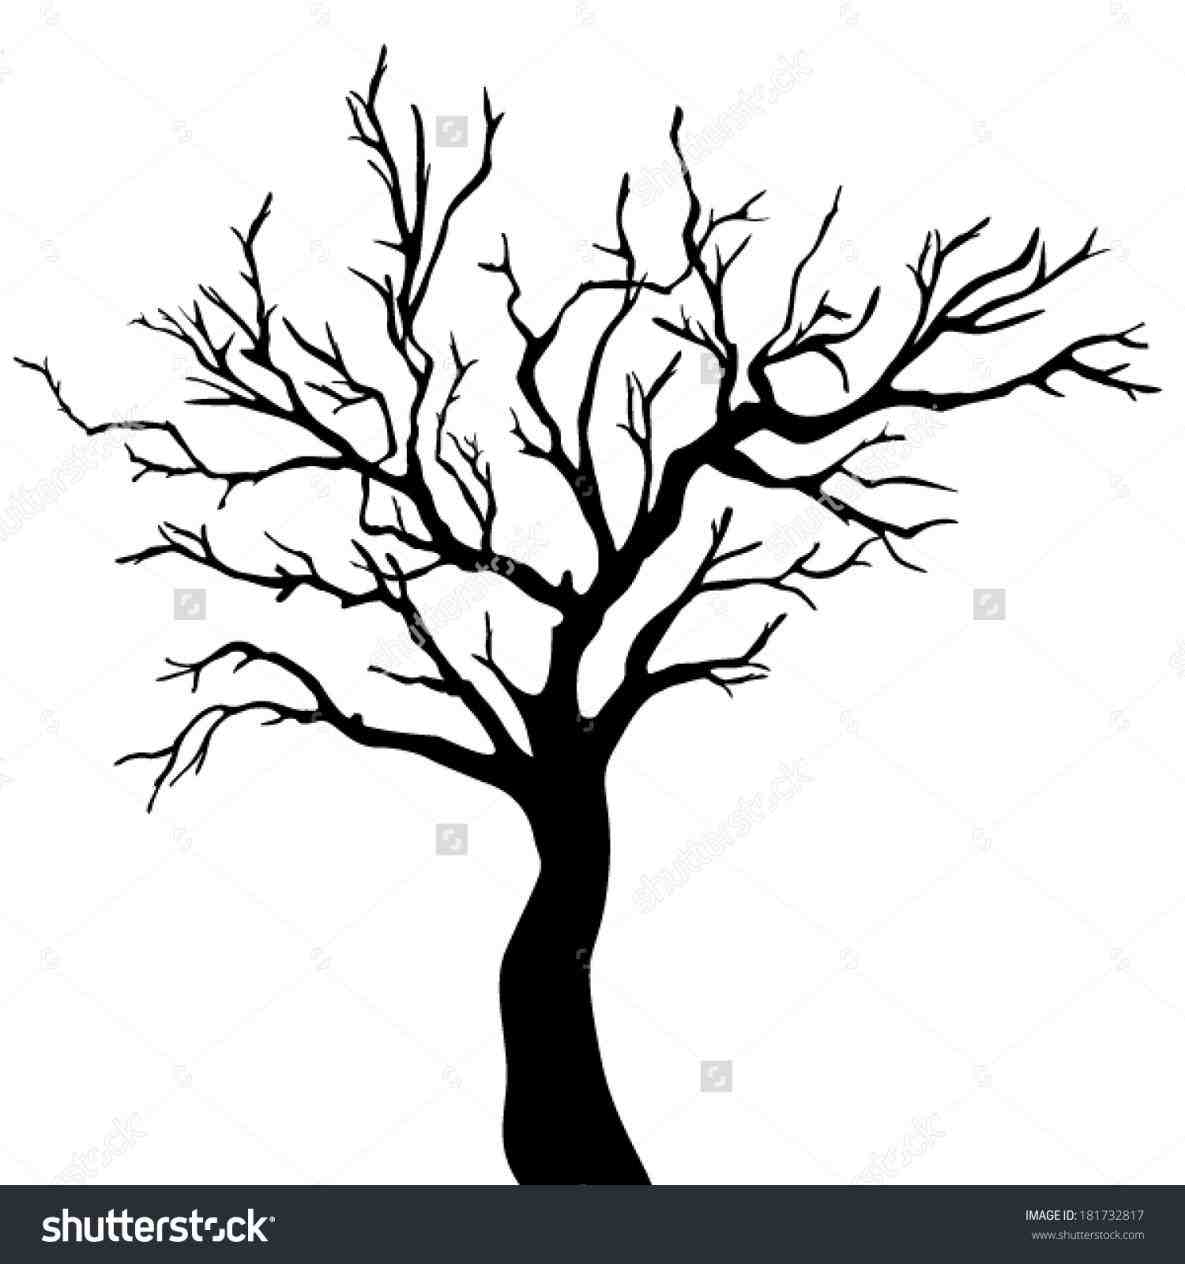 Willow Tree Drawing At Getdrawings